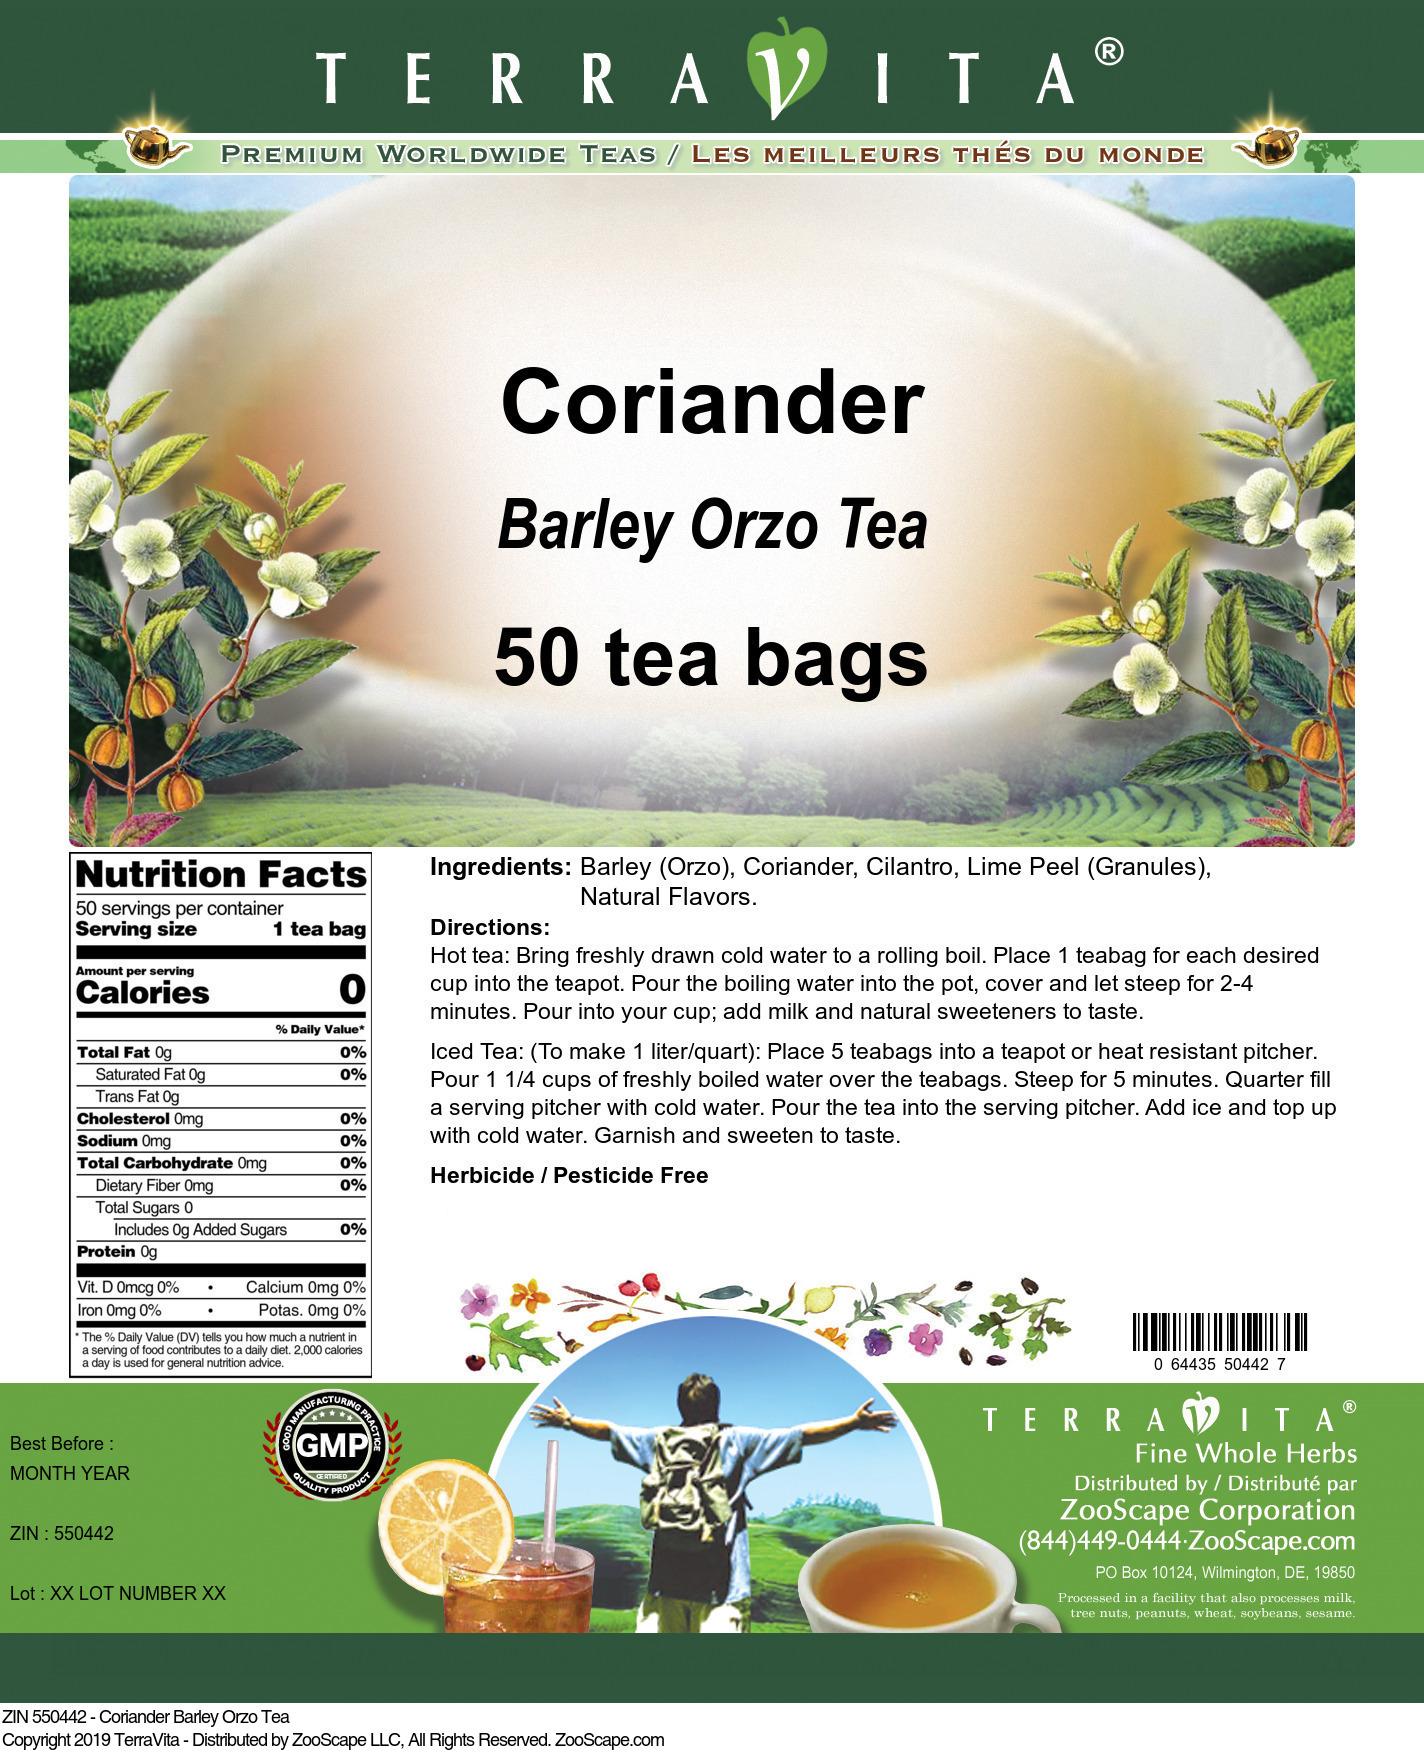 Coriander Barley Orzo